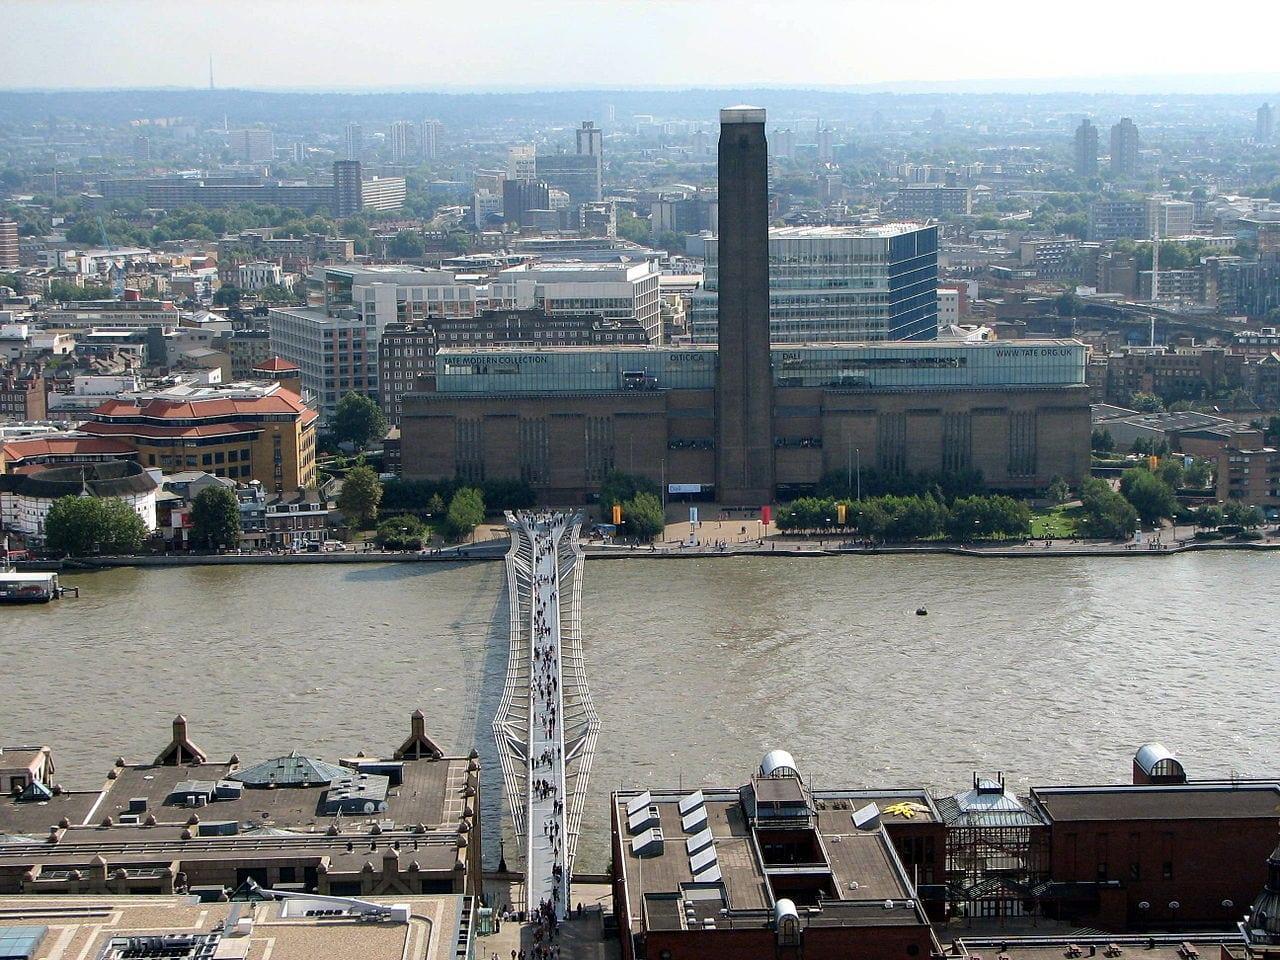 Vistas del Tate Modern